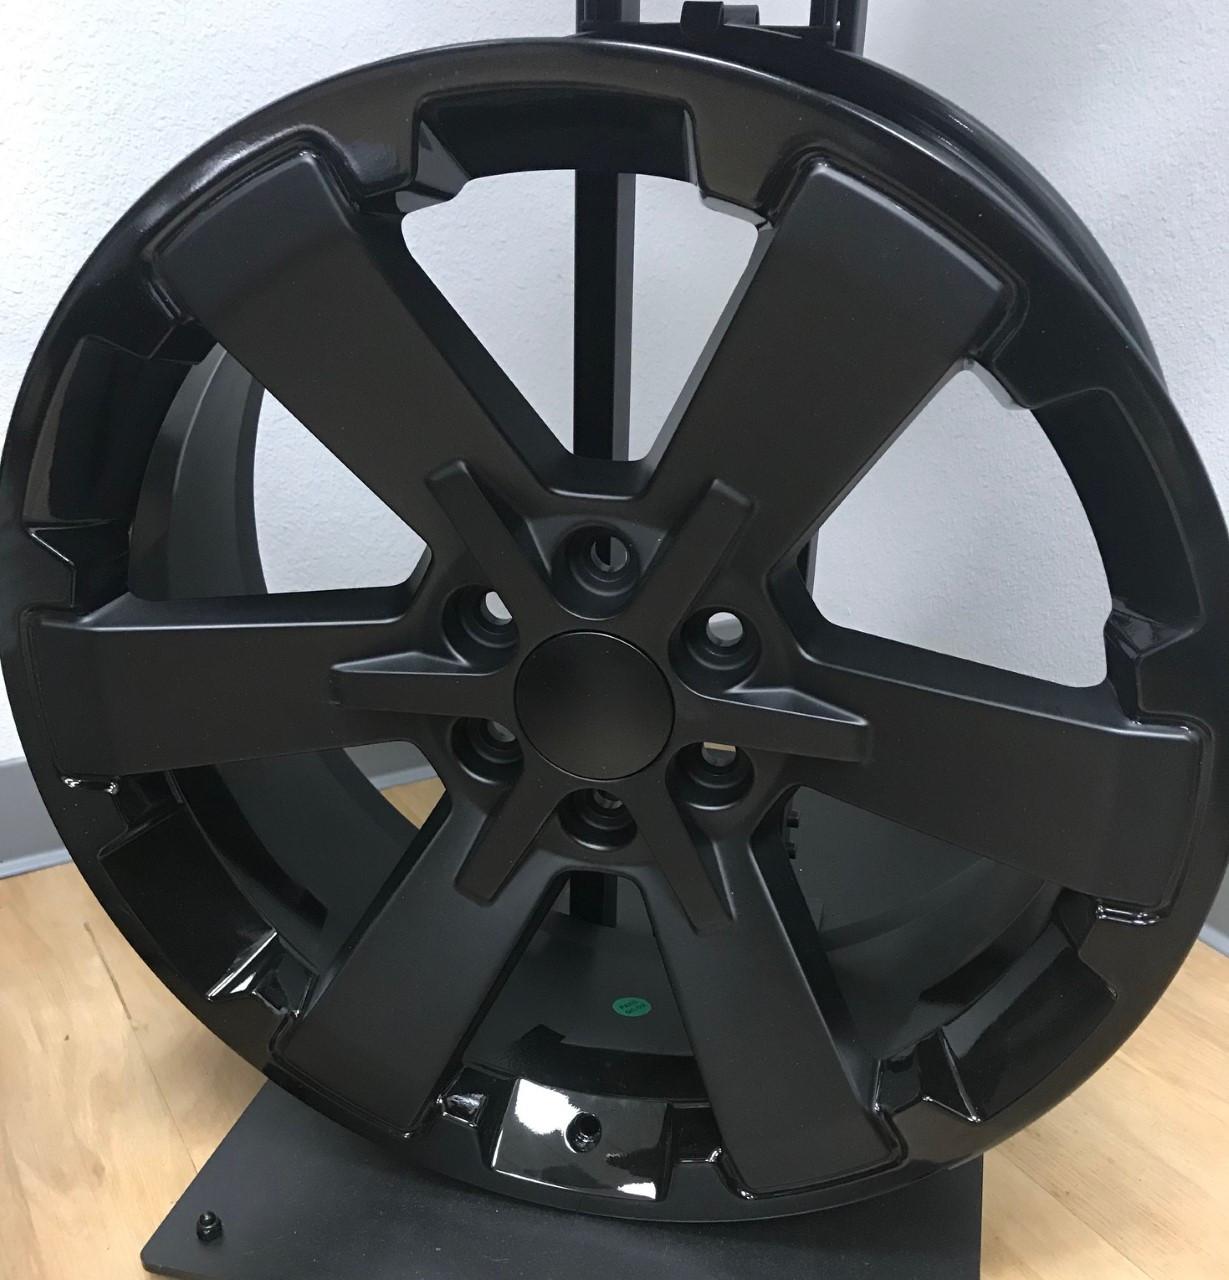 24 Fits Chevy 1500 Midnight Wheels Two Tone Black Rally Gmc Yukon Denali Ck162 Set Of 4 24x10 Rims Stock Wheel Solutions